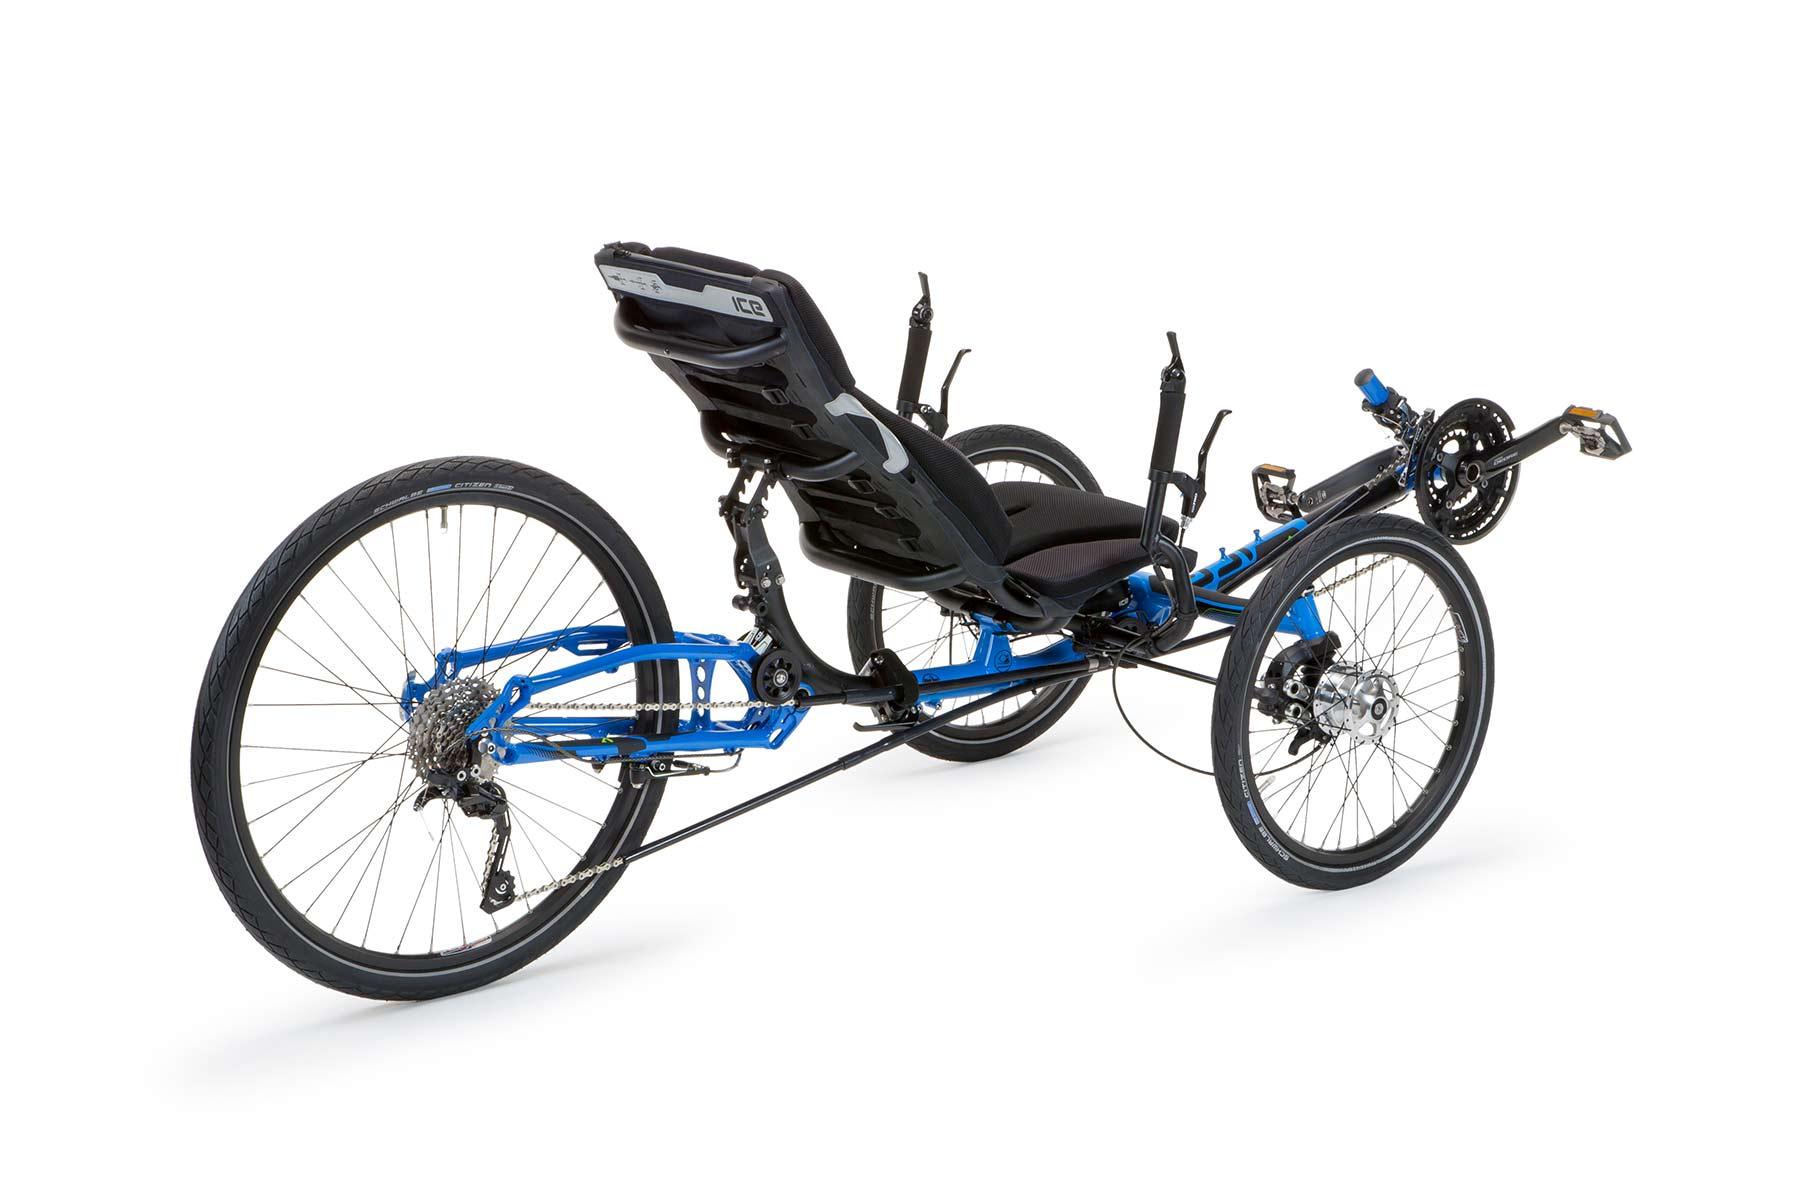 ICE Adventure - Relaxed Rugged Recumbent Trike, Bike